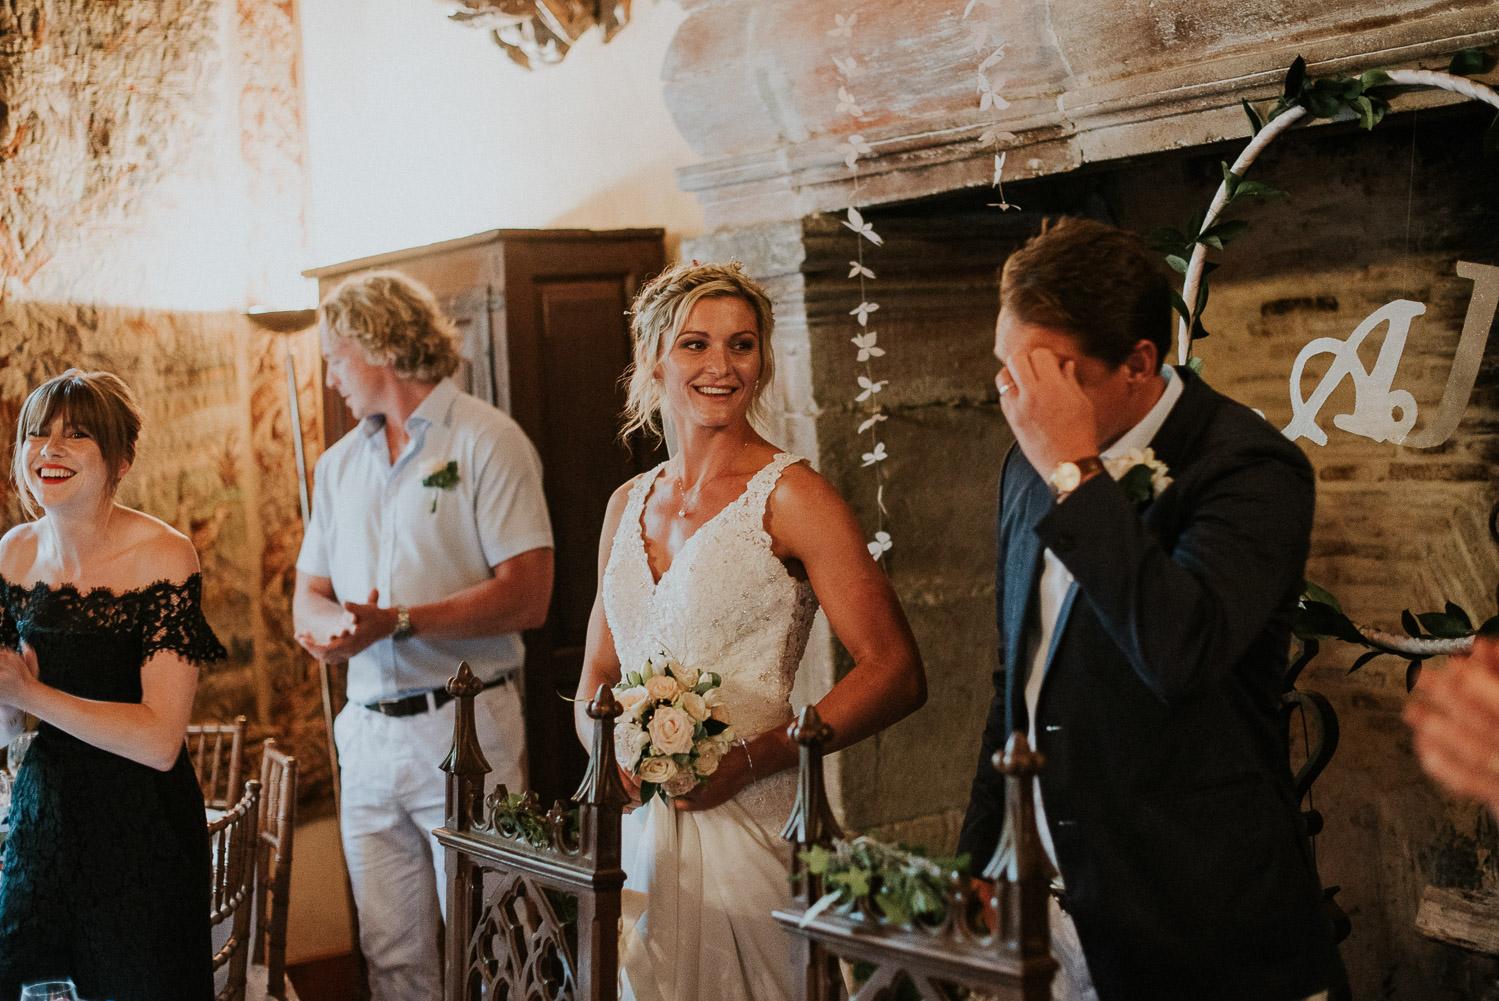 chateau_la_commanderie_mirepoix__wedding_katy_webb_photography_france_UK139